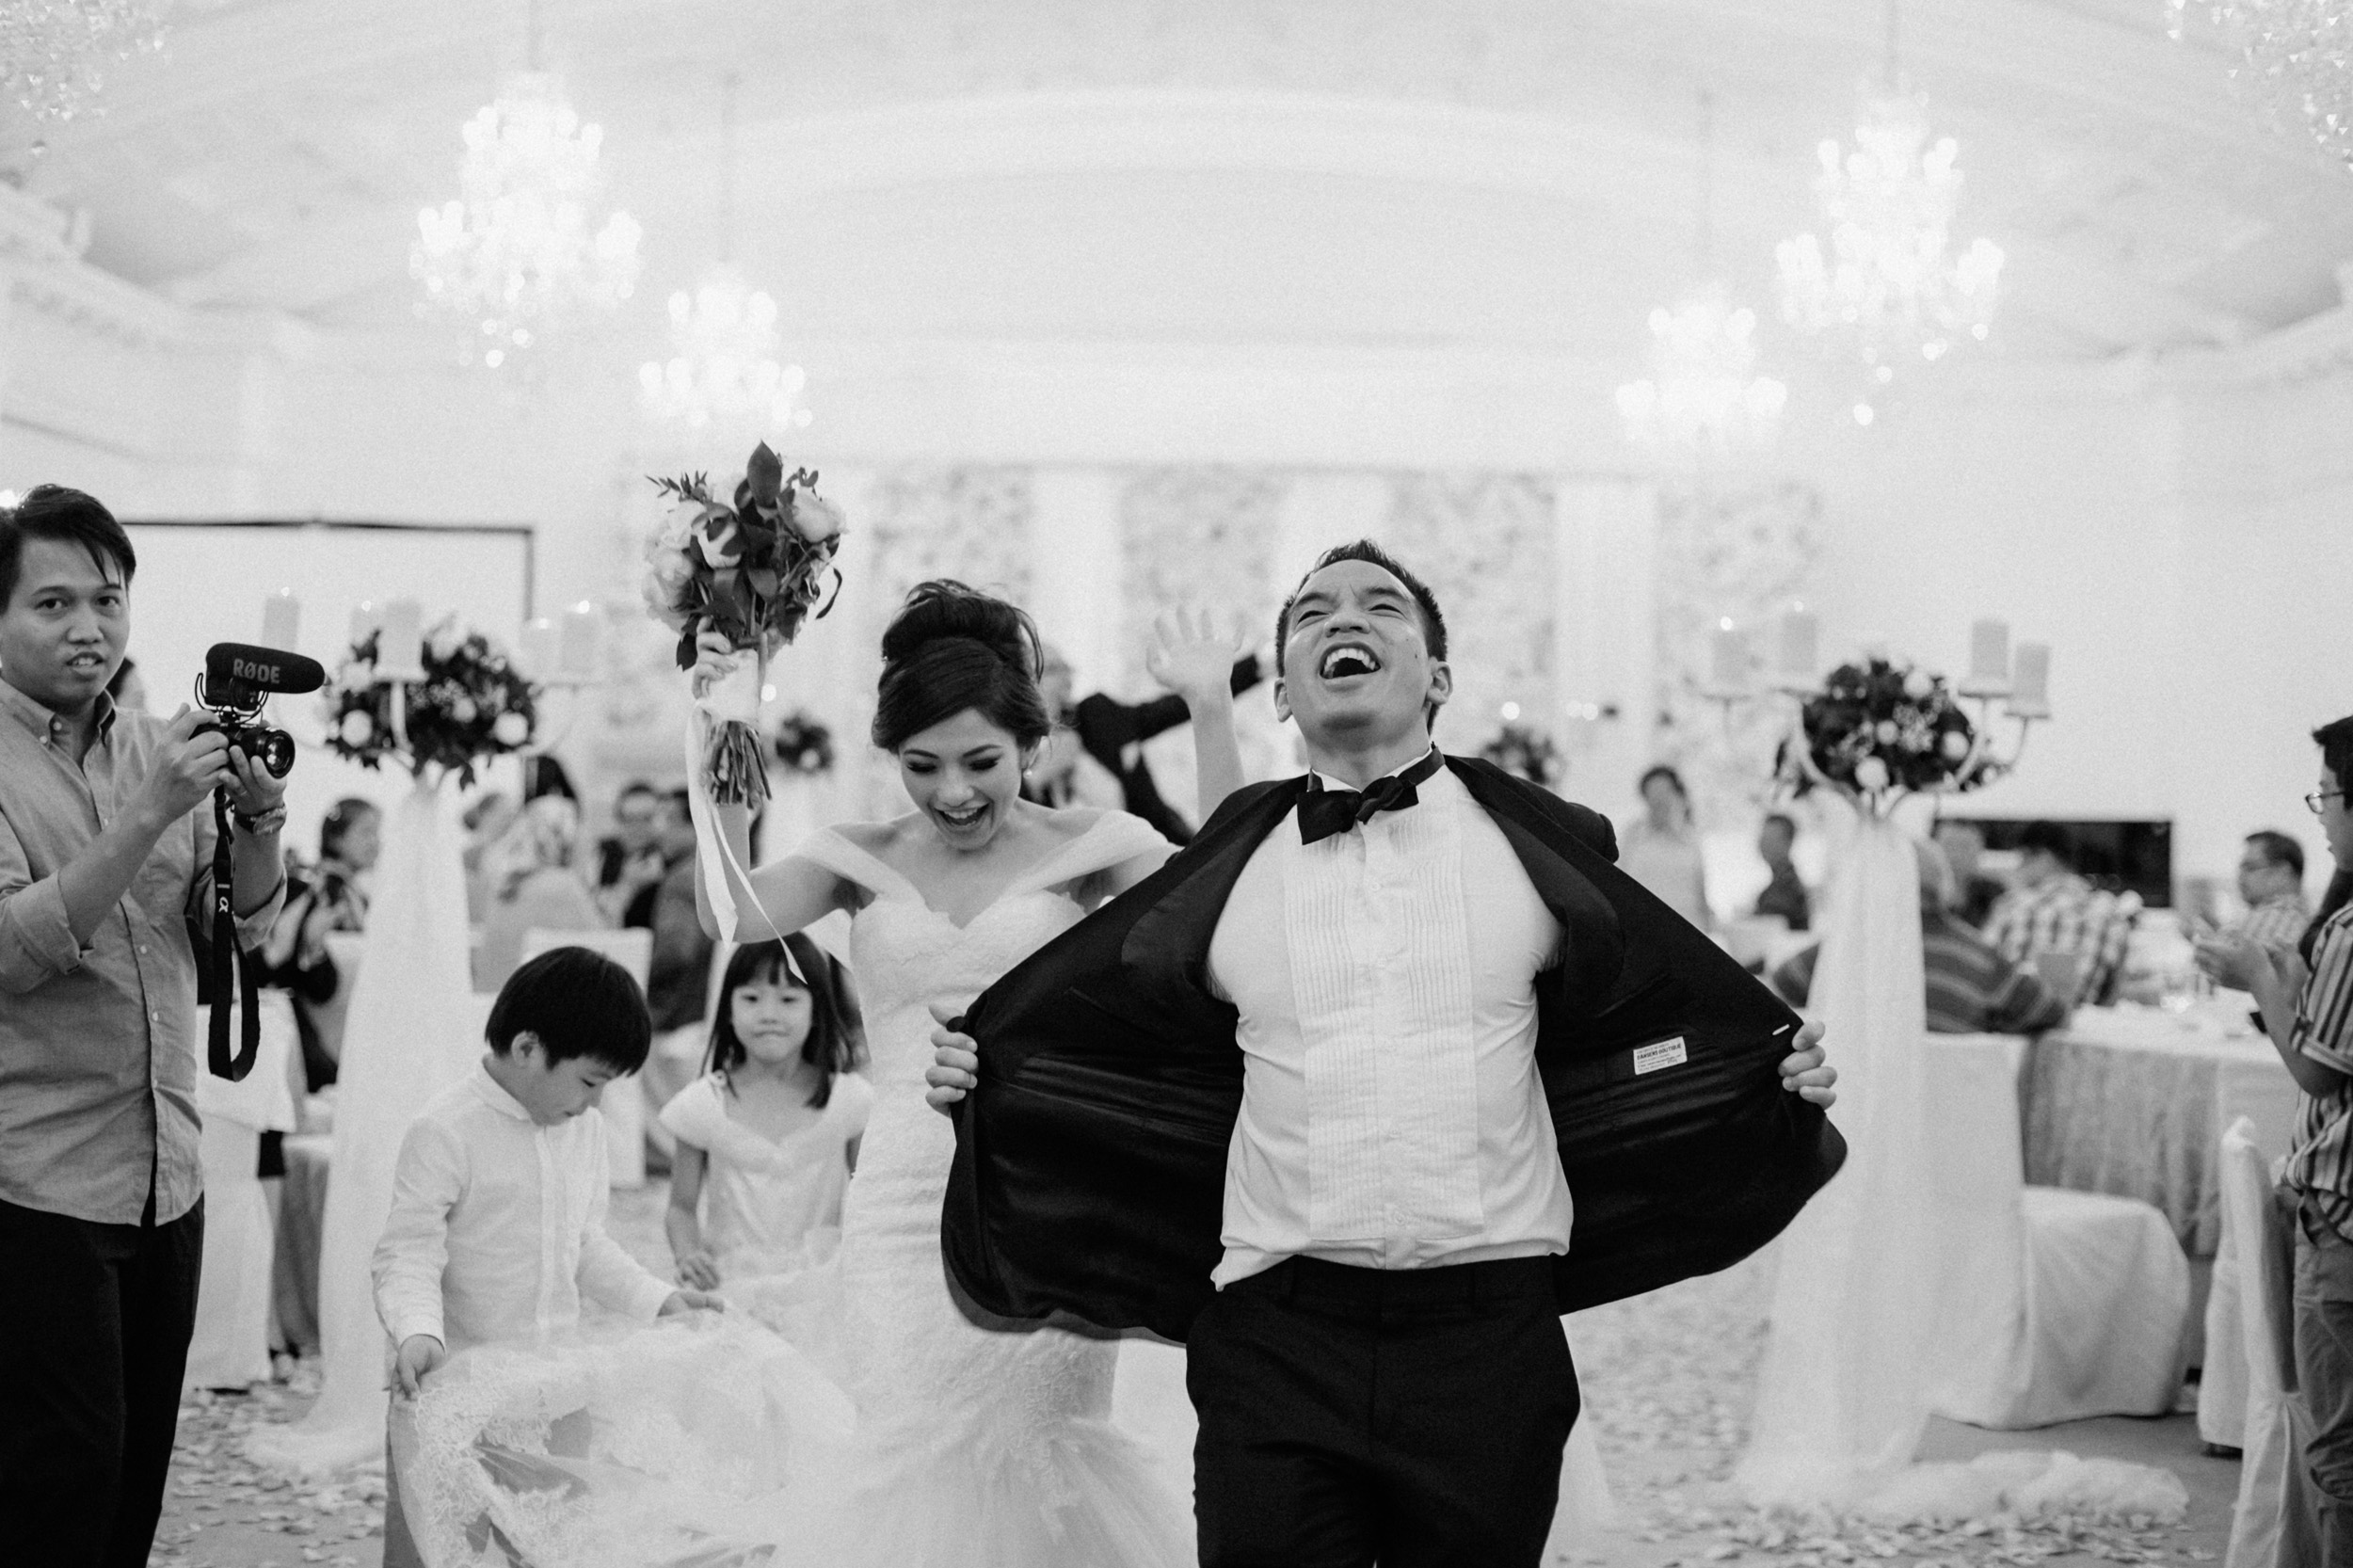 singapore-wedding-photographer-photography-wmt2017-111.jpg